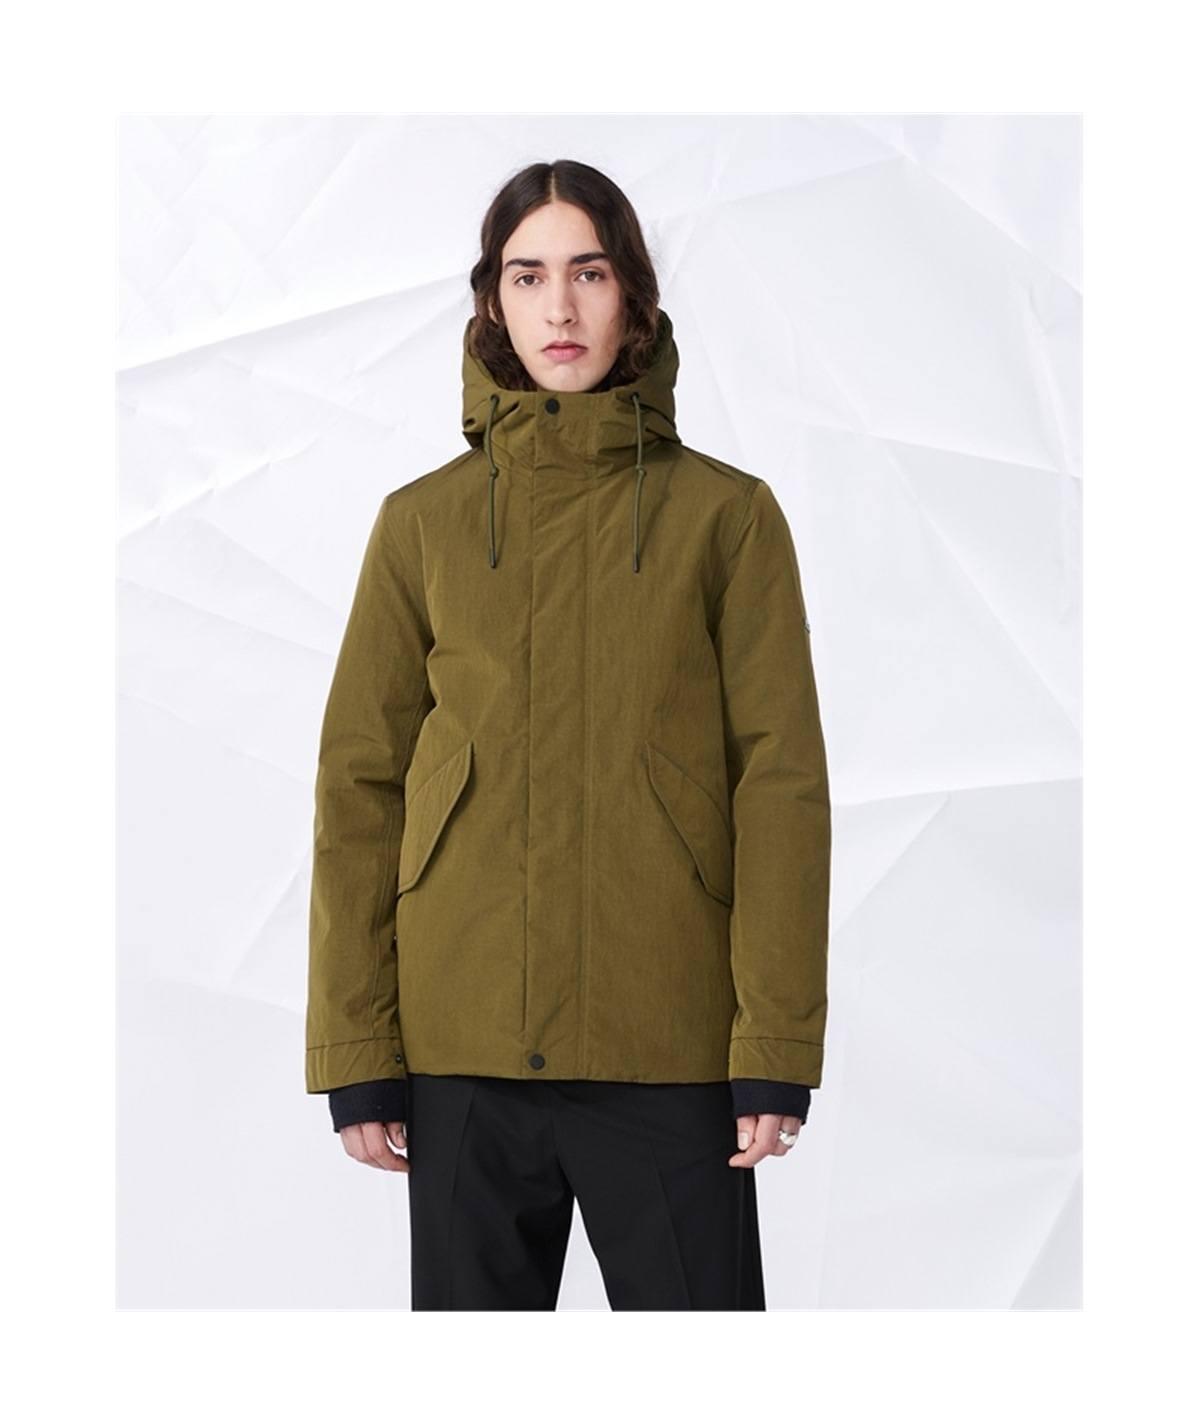 giacca jacket indio casuals elvine inverno